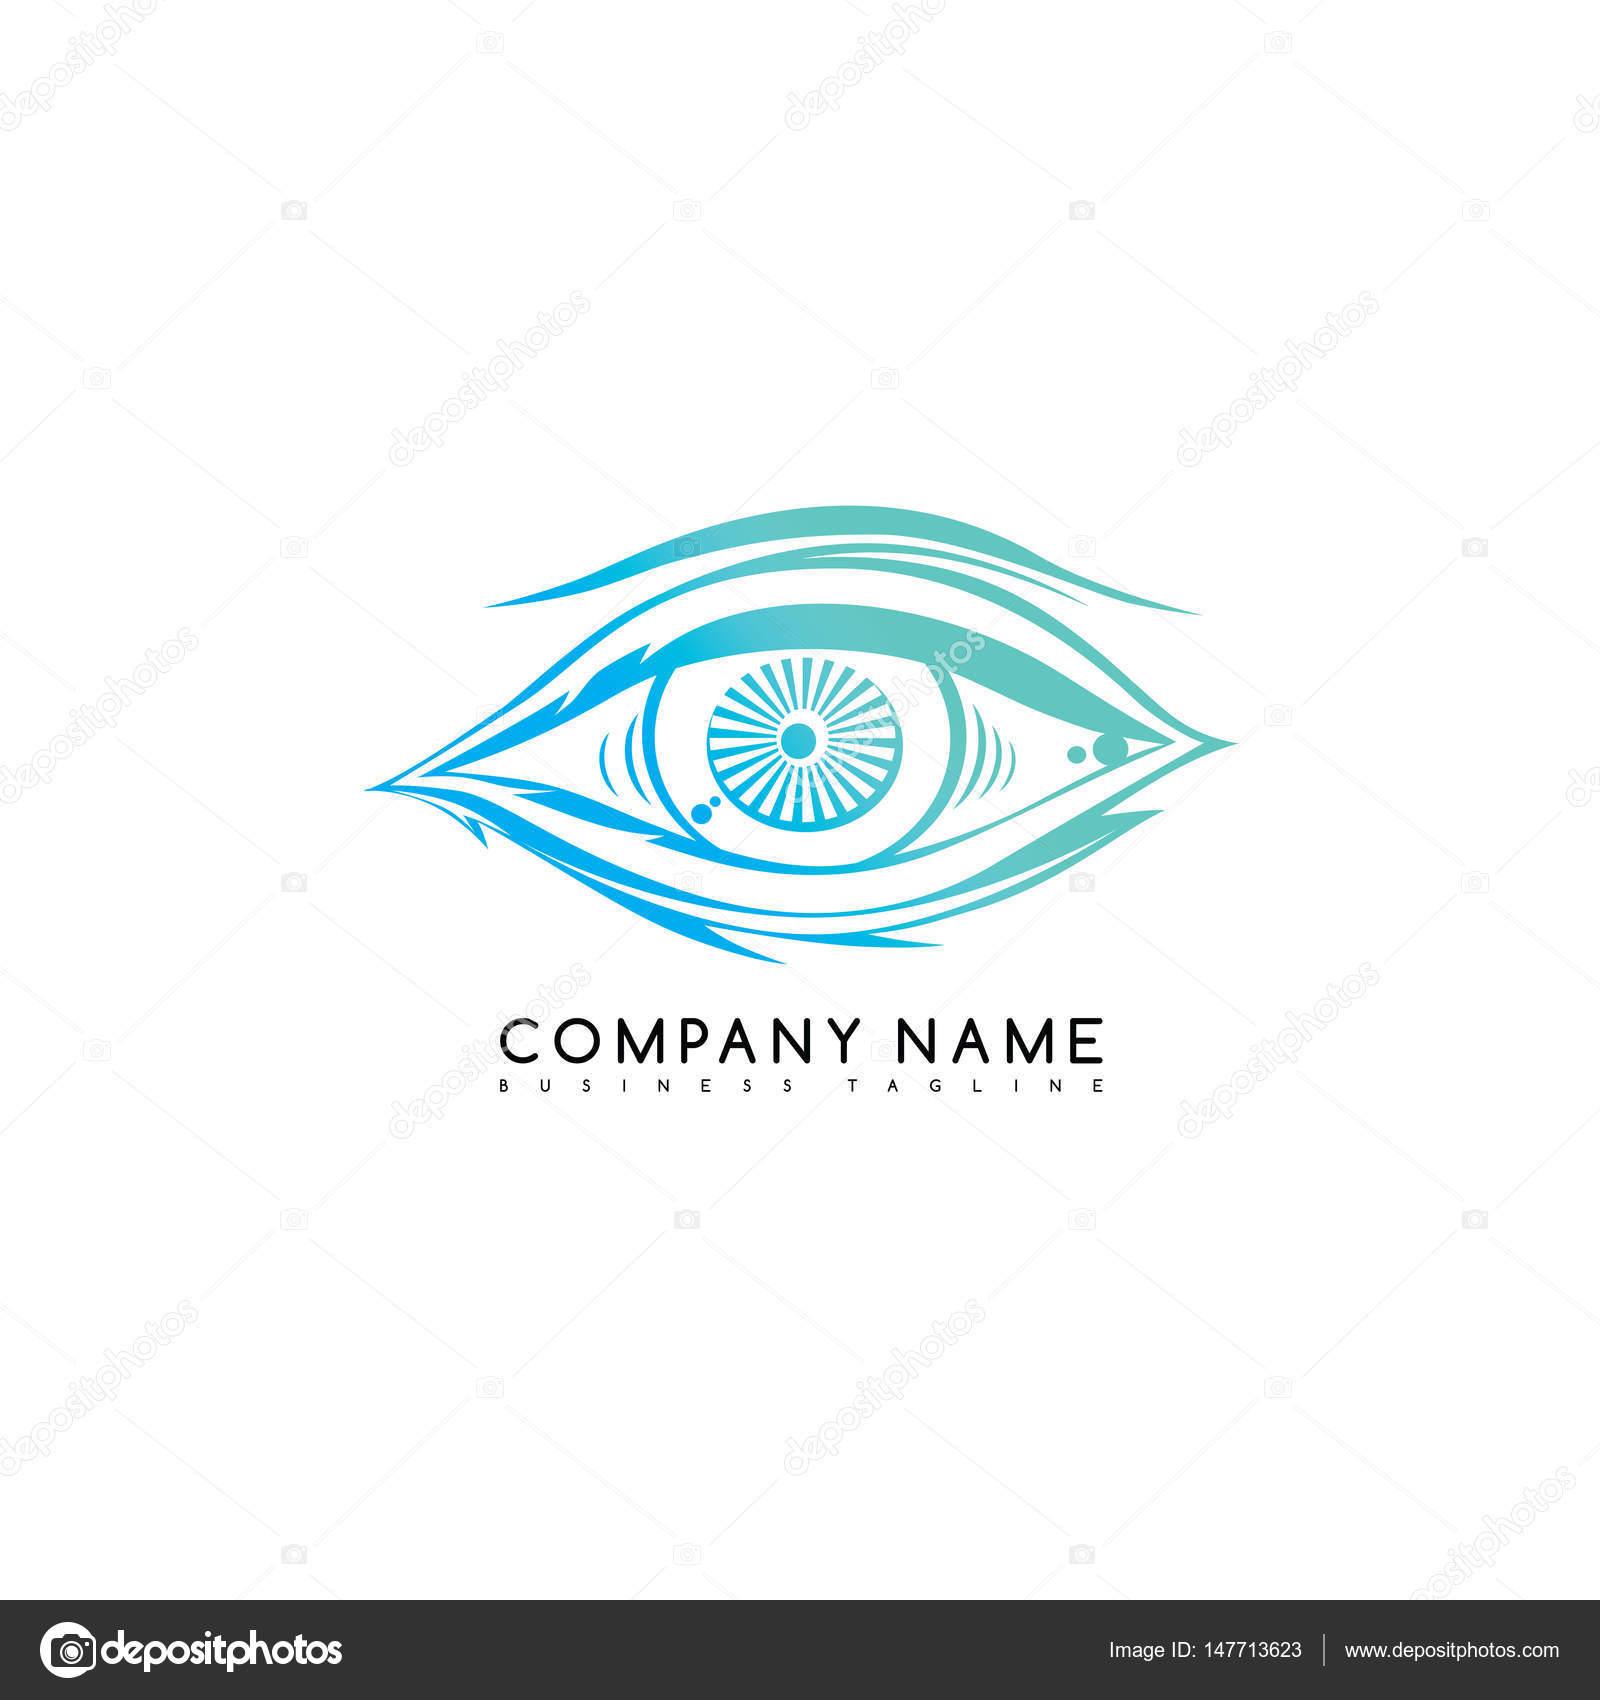 Company name business tagline stock vector vectorfirst 147713623 company name business tagline stock vector 147713623 buycottarizona